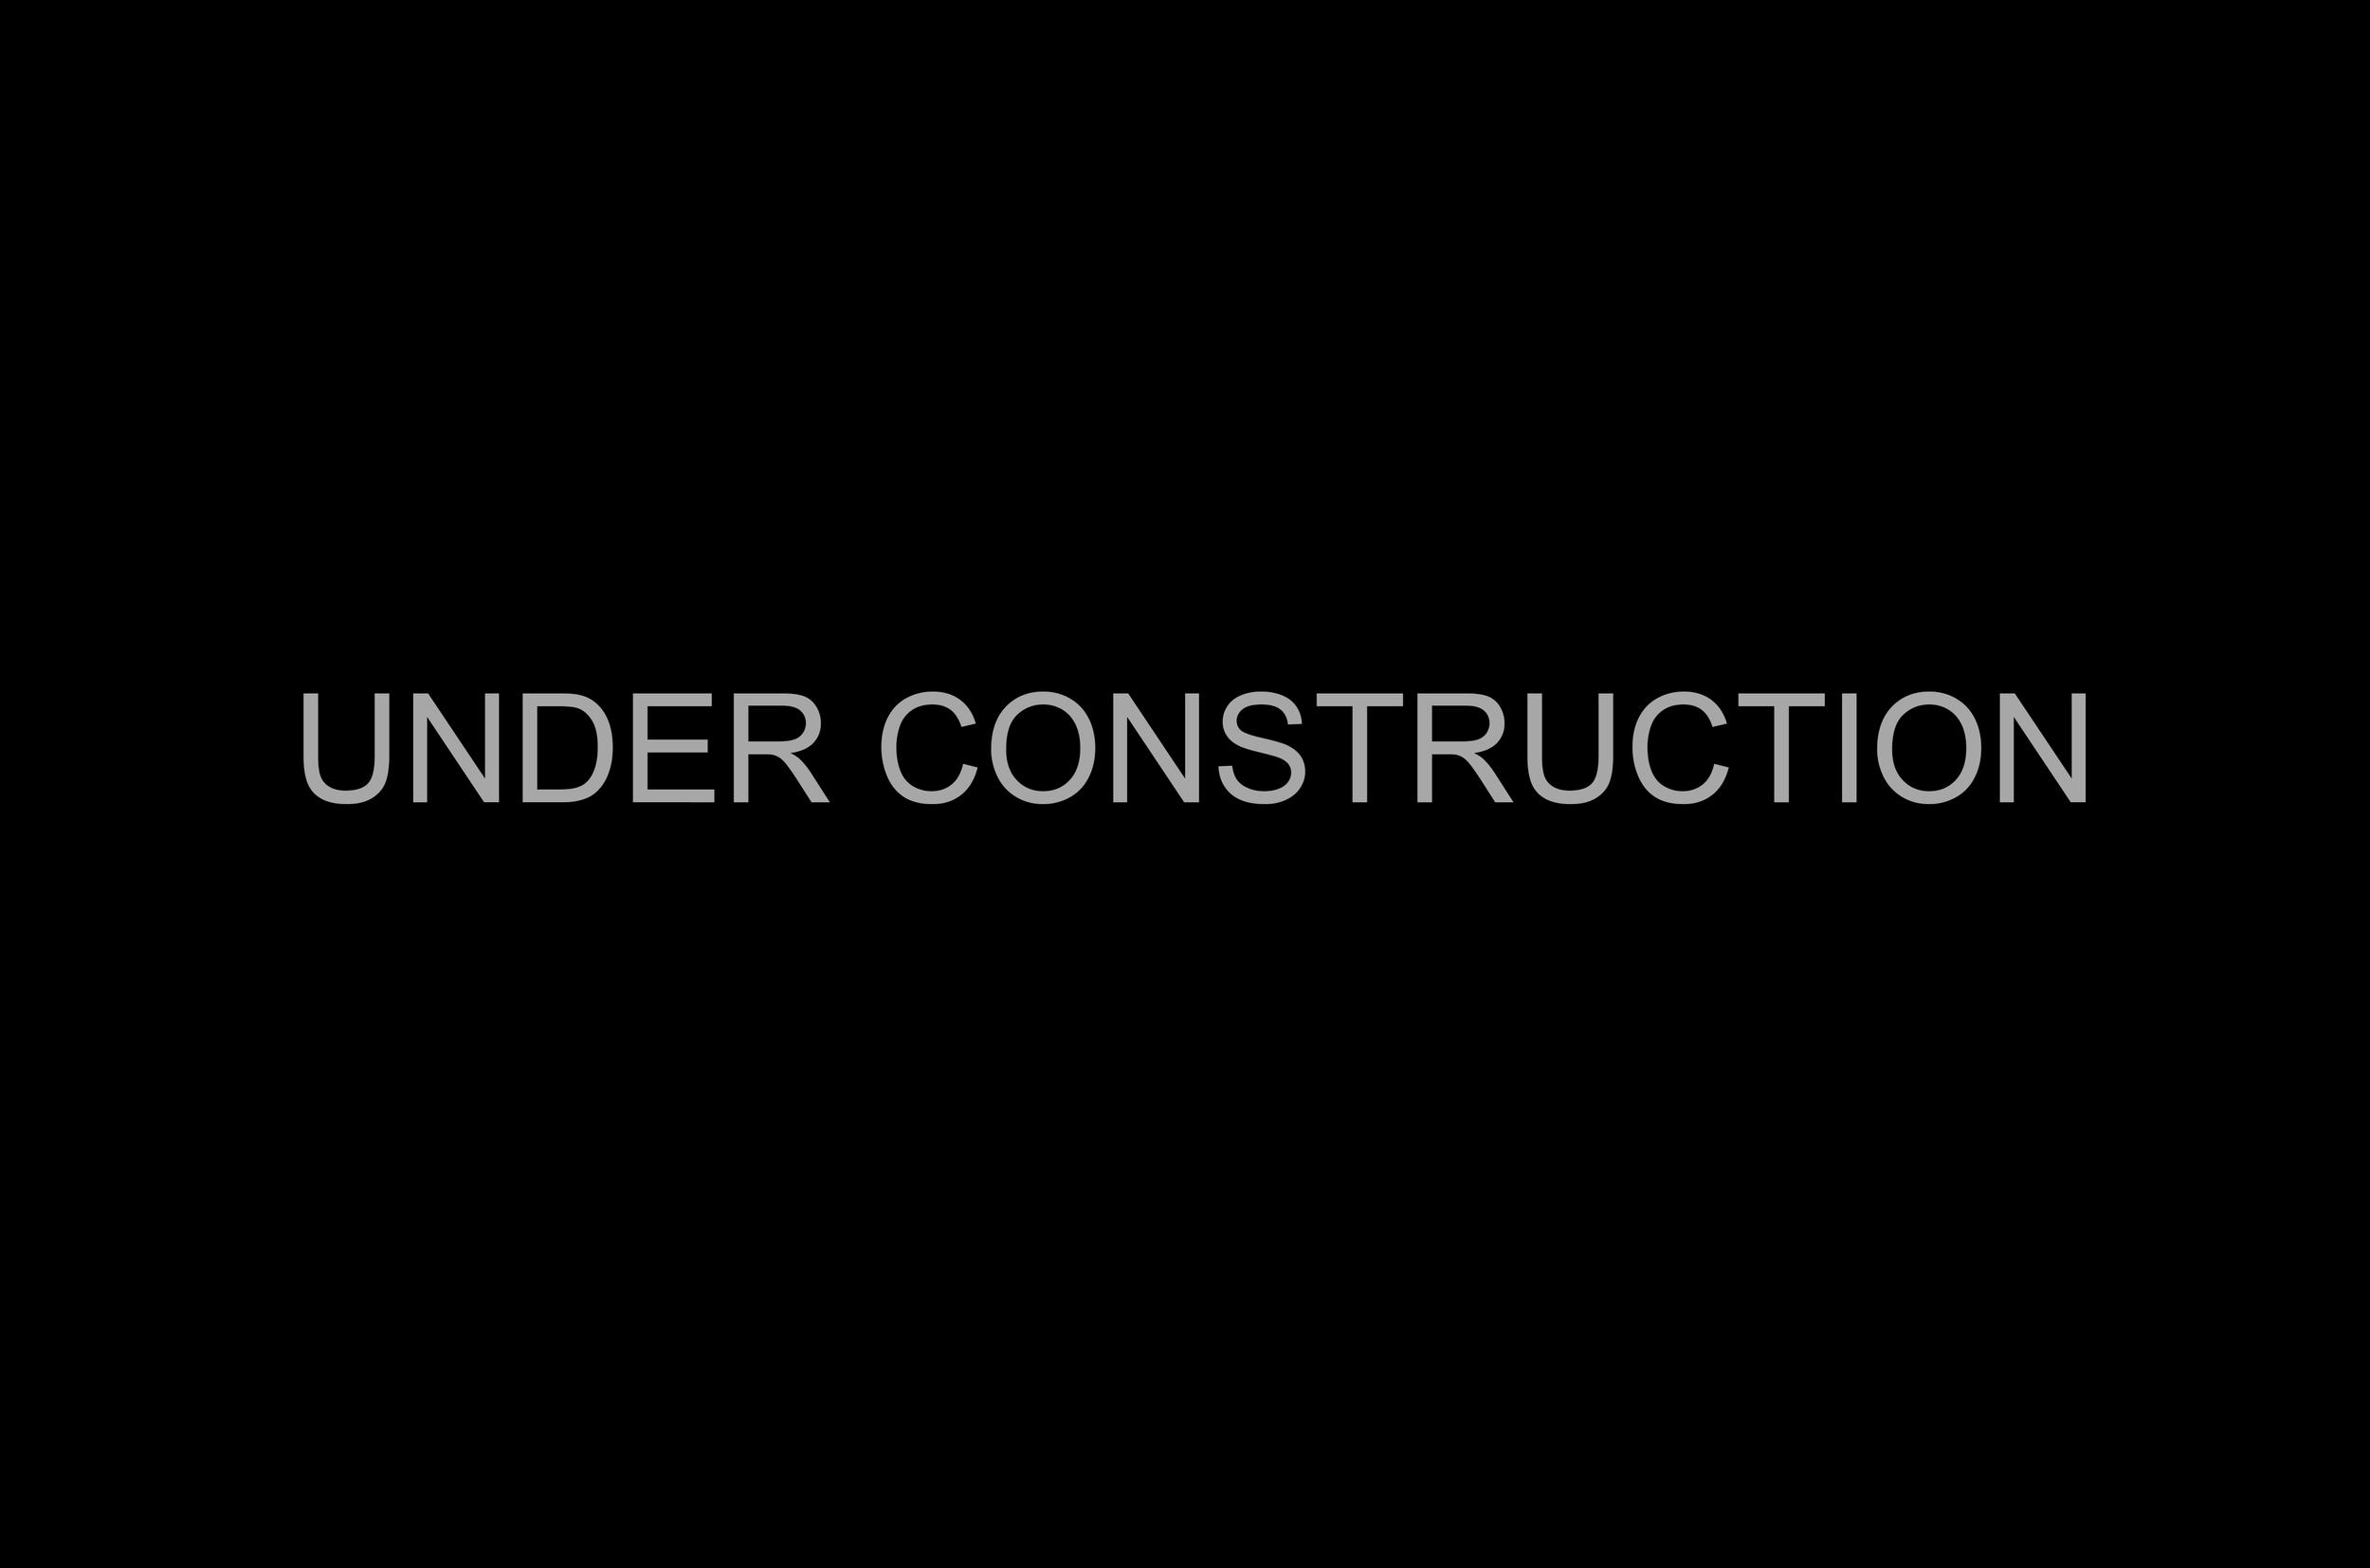 Under construction text.jpg